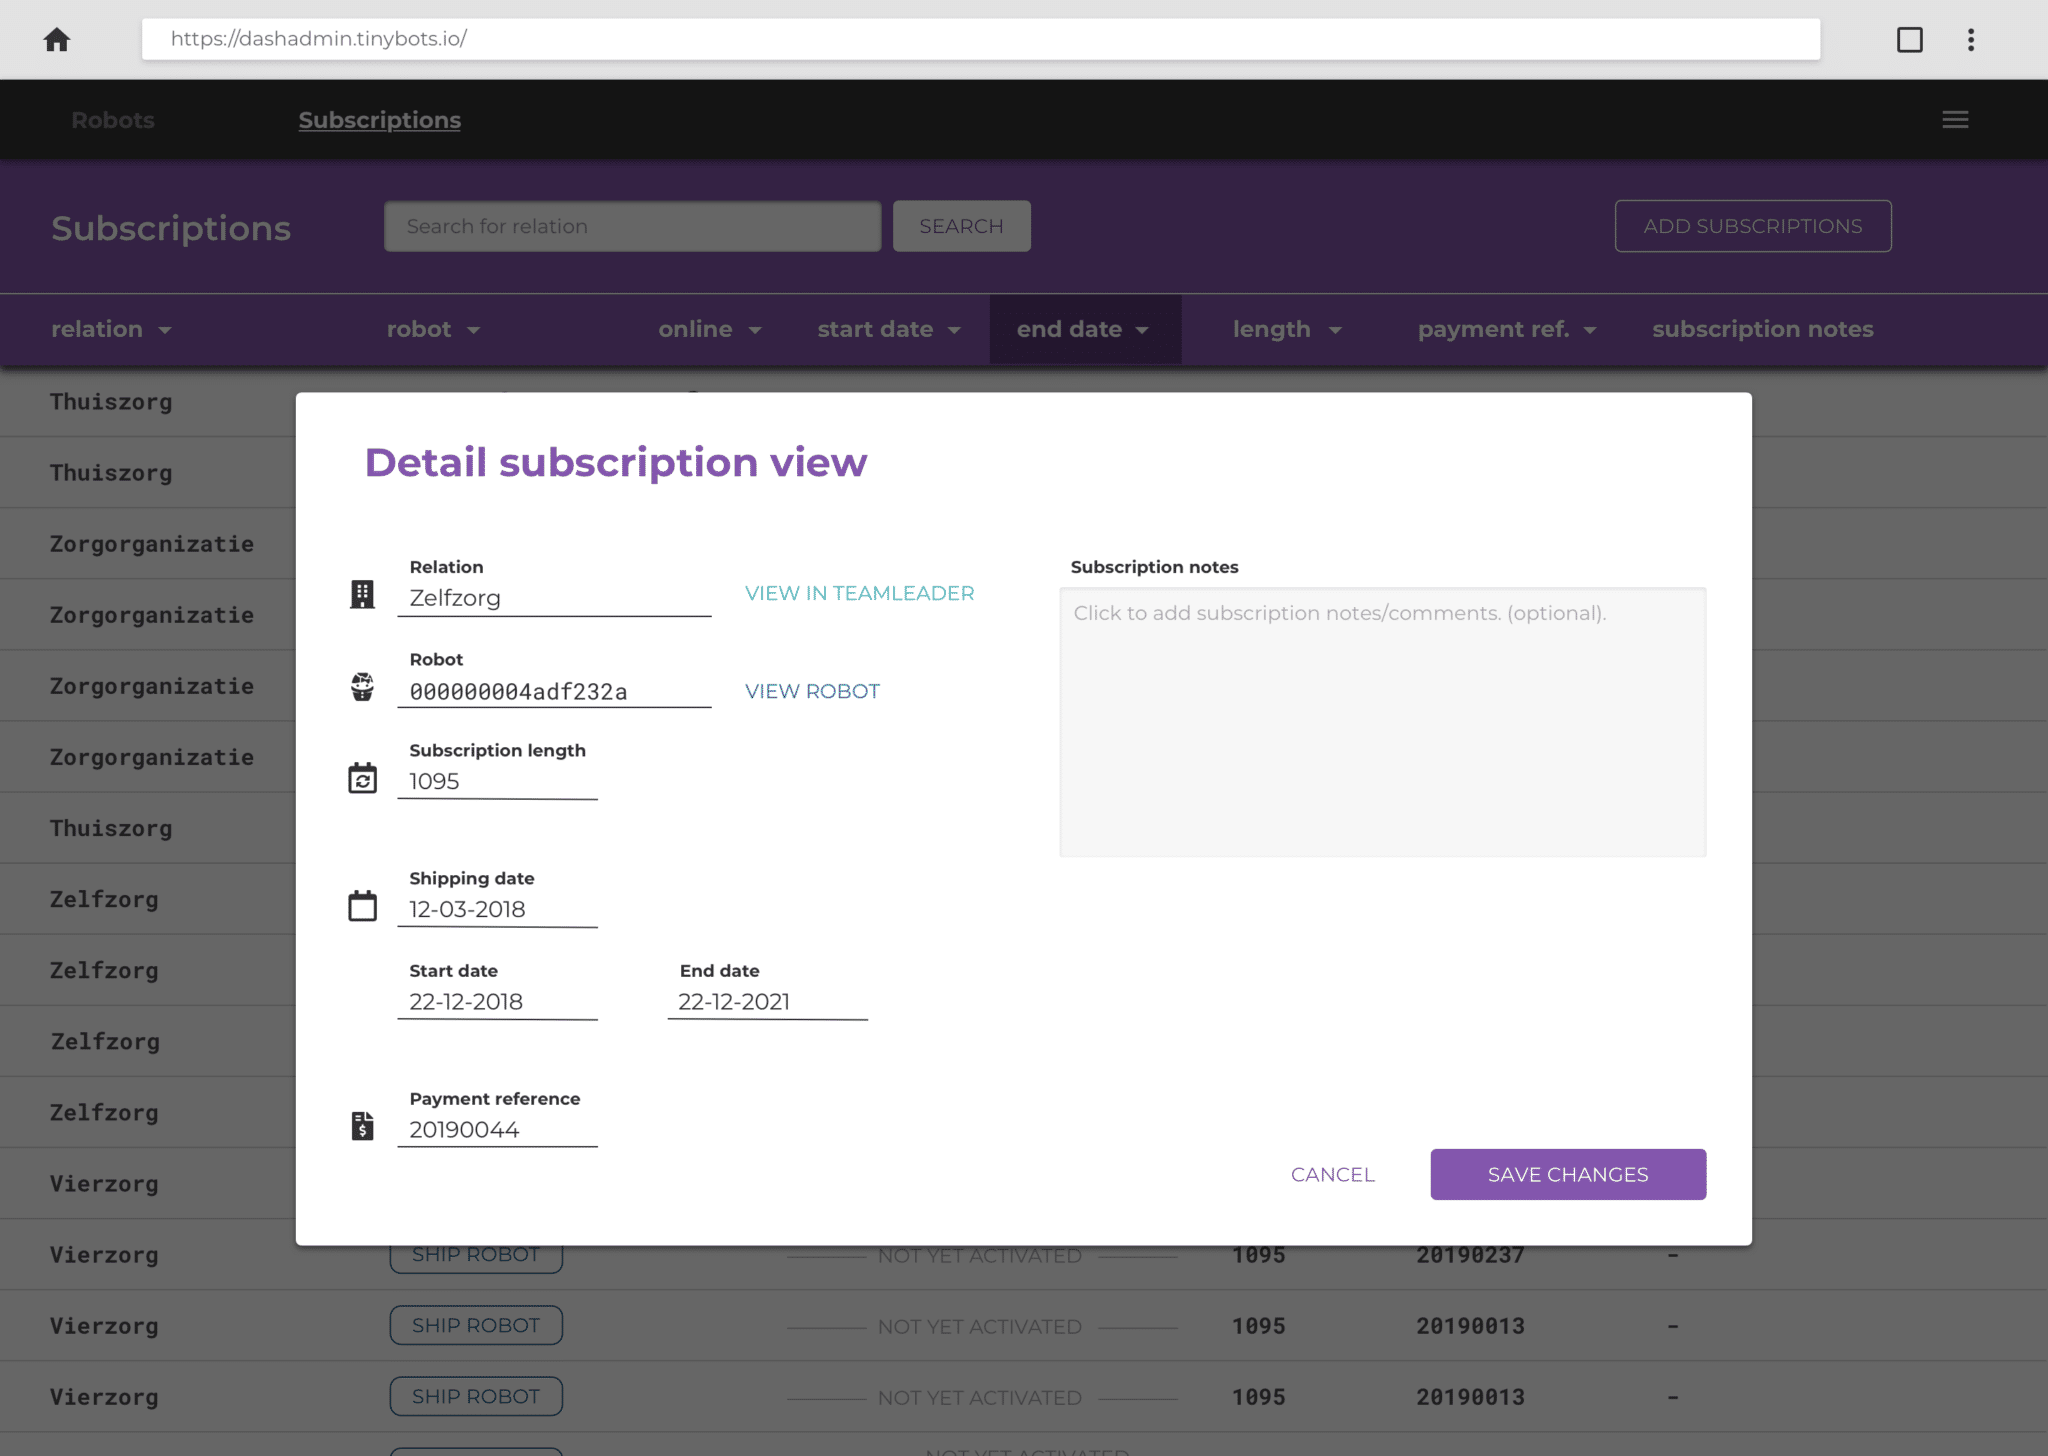 Screenshot of an administrative dashboard. The modal popup shows information regarding a subscription